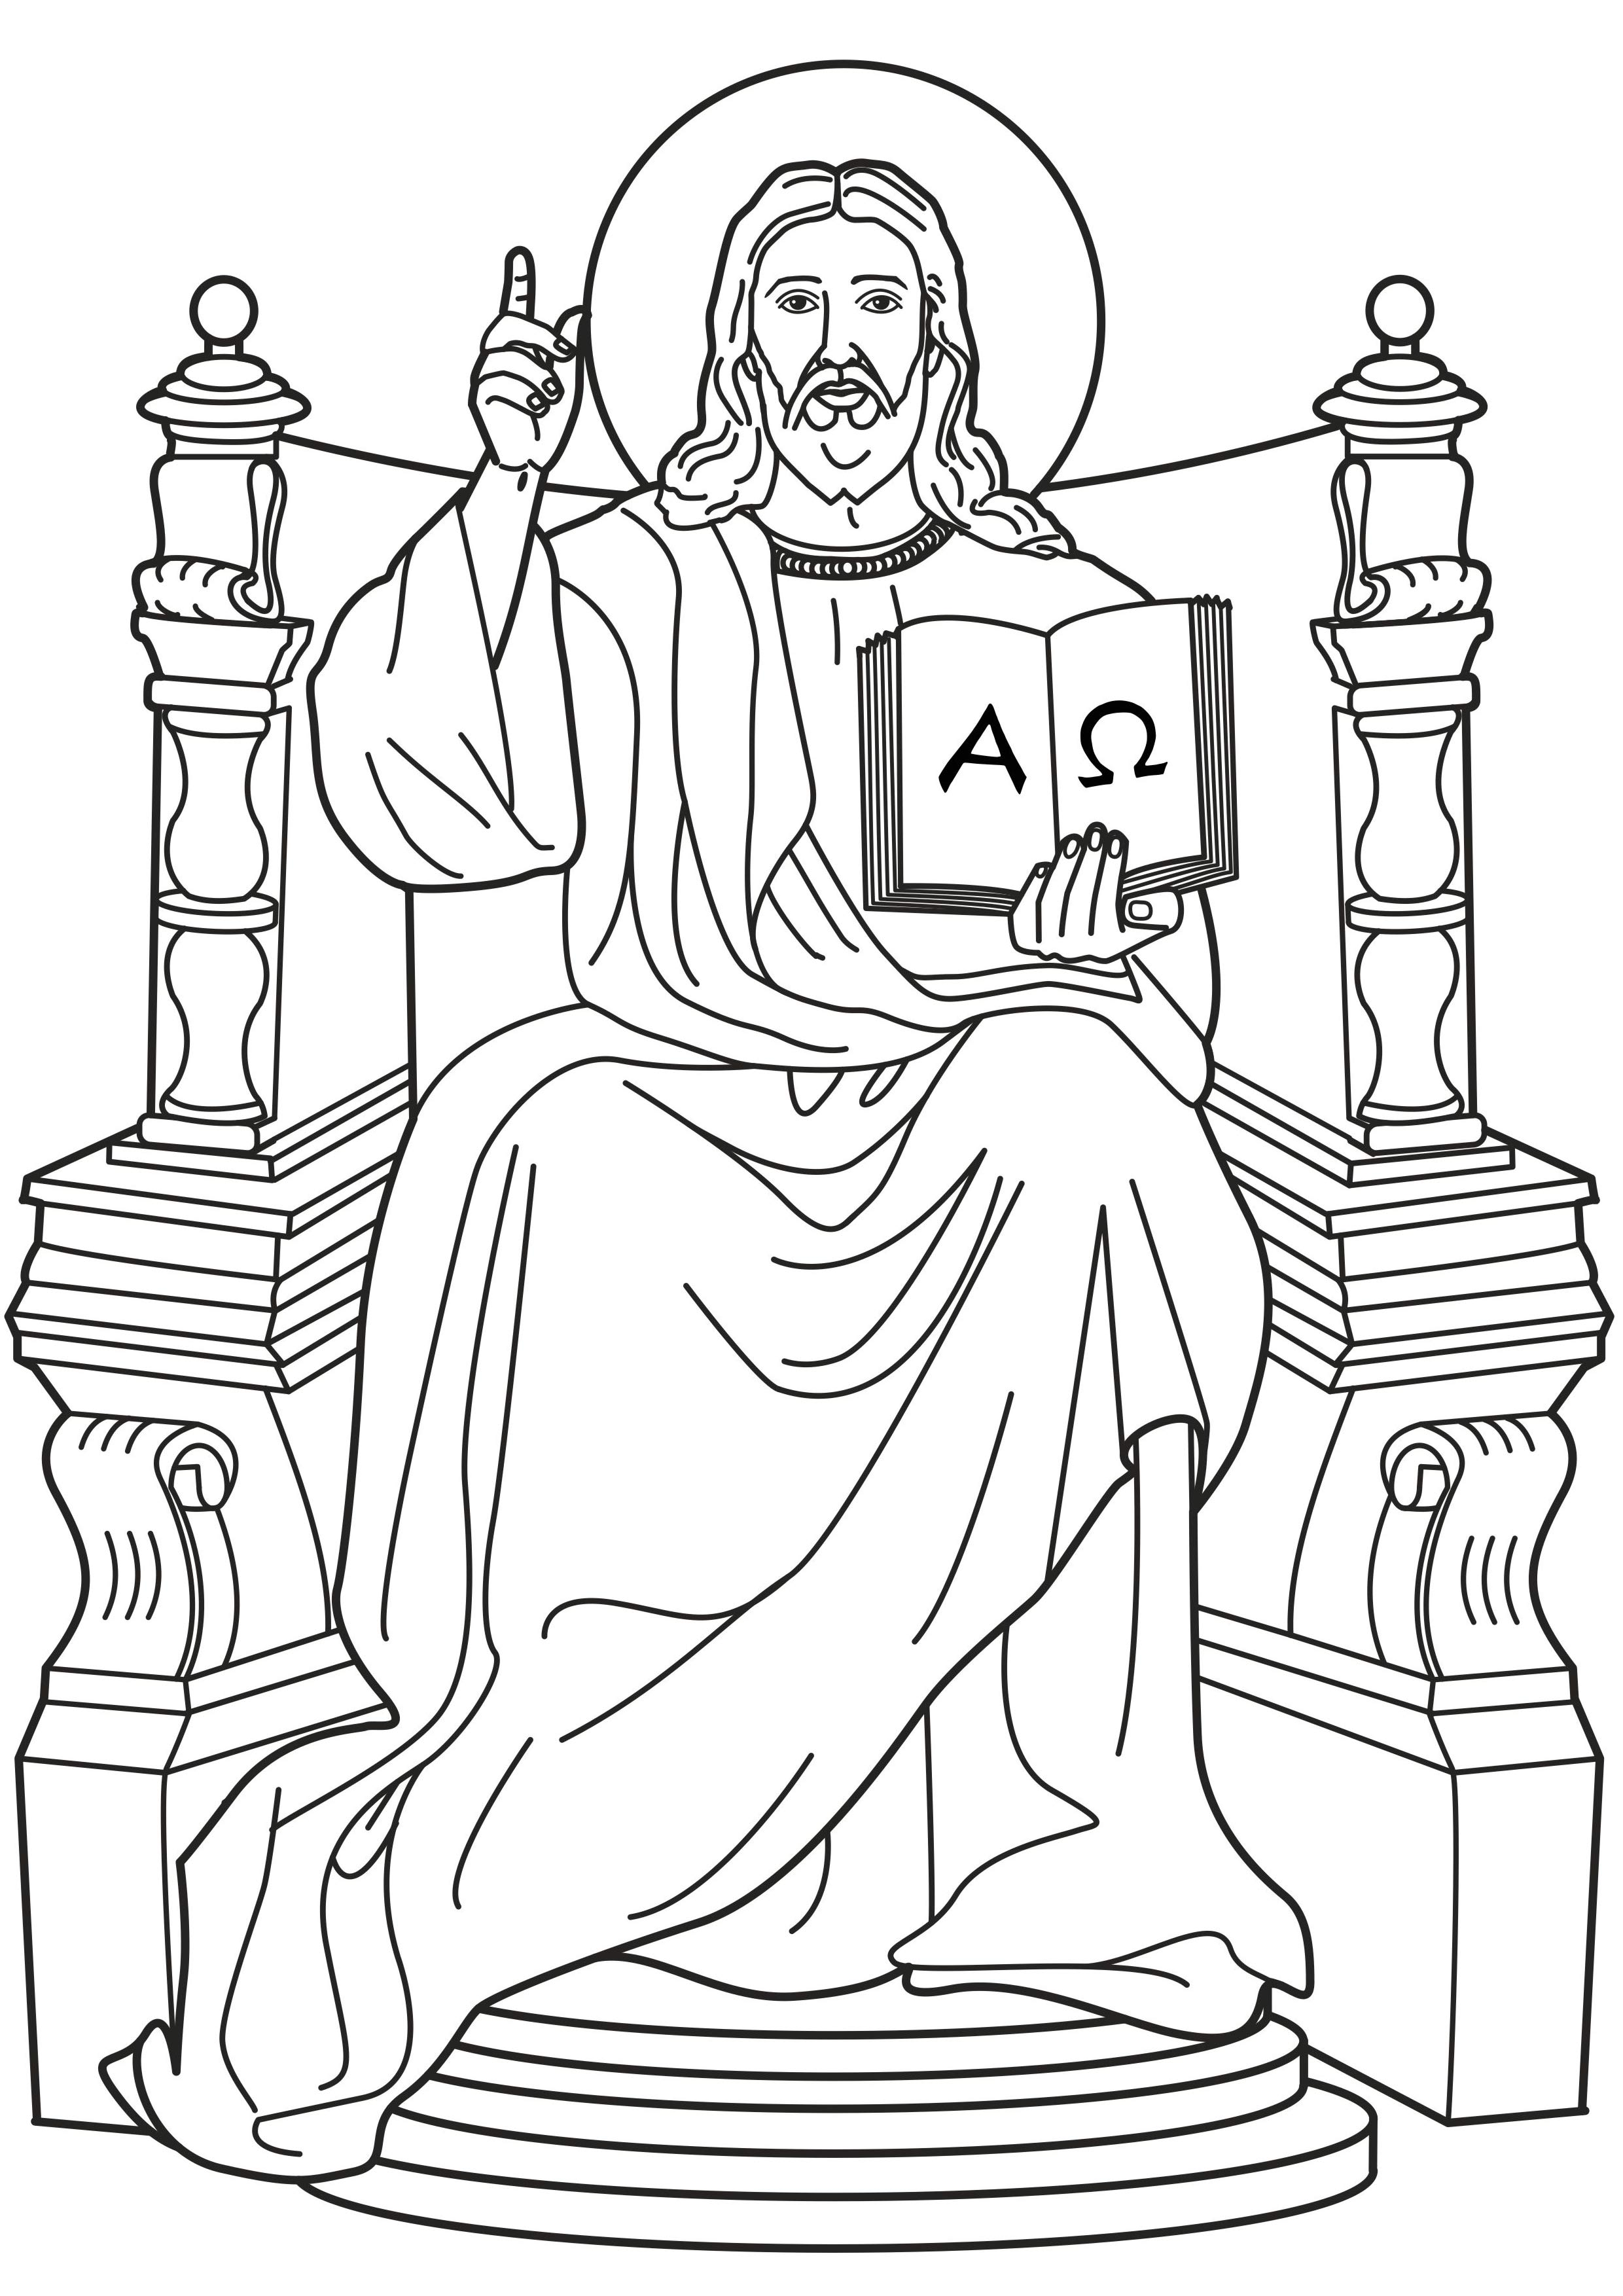 Kingcloud coloring #1, Download drawings